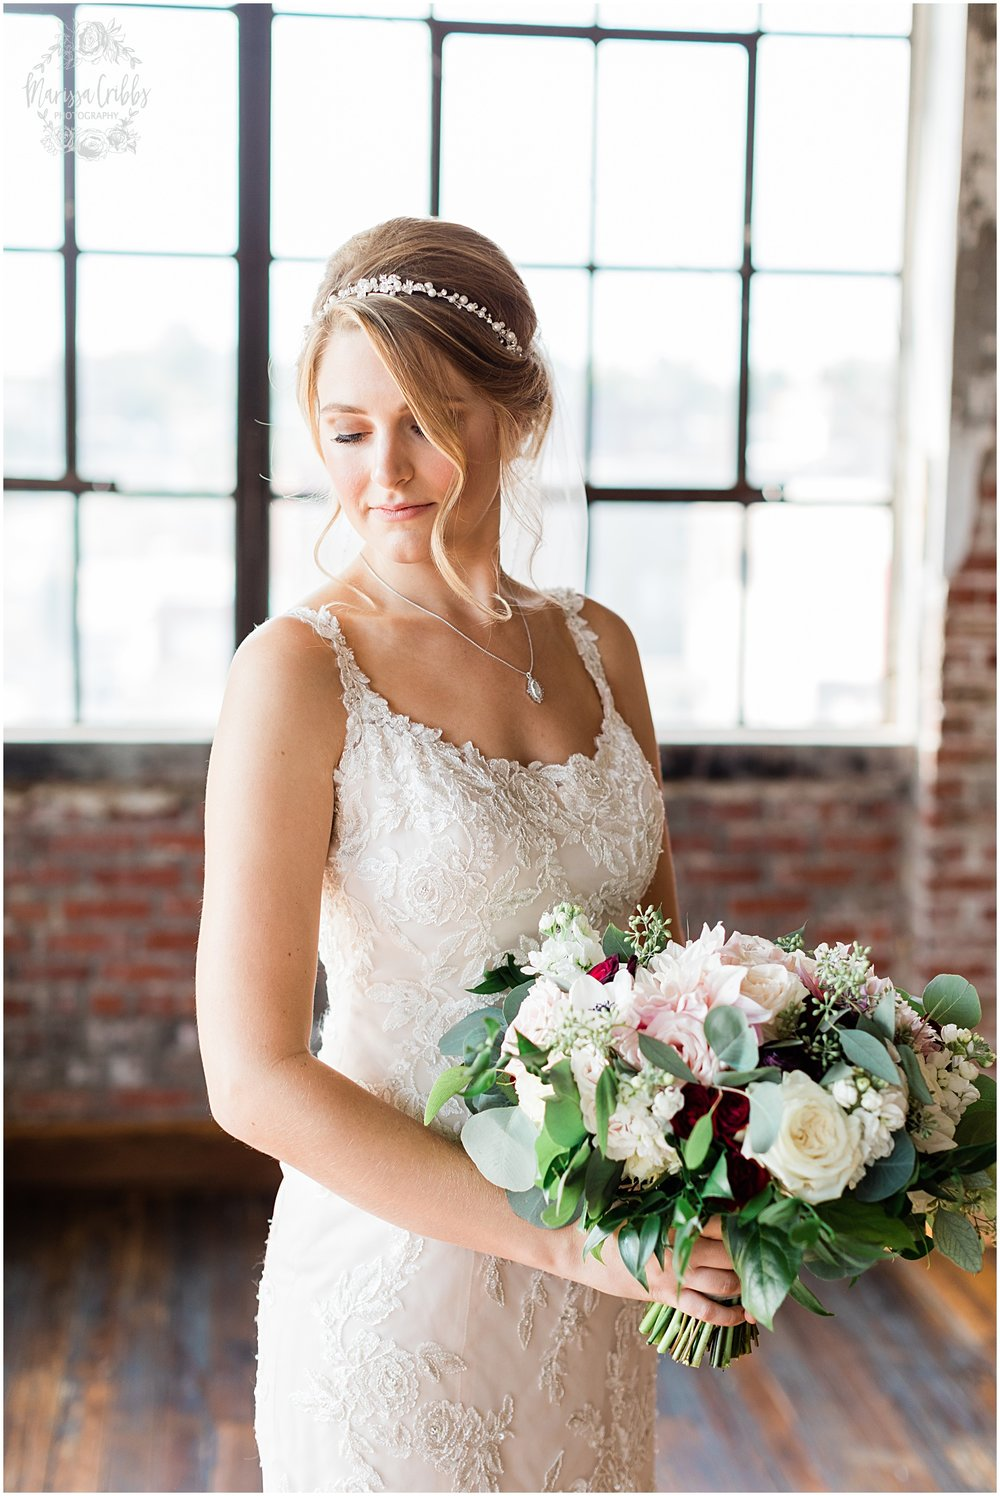 BAUER WEDDING | KELSEA & JUSTIN | MARISSA CRIBBS PHOTOGRAPHY_6512.jpg